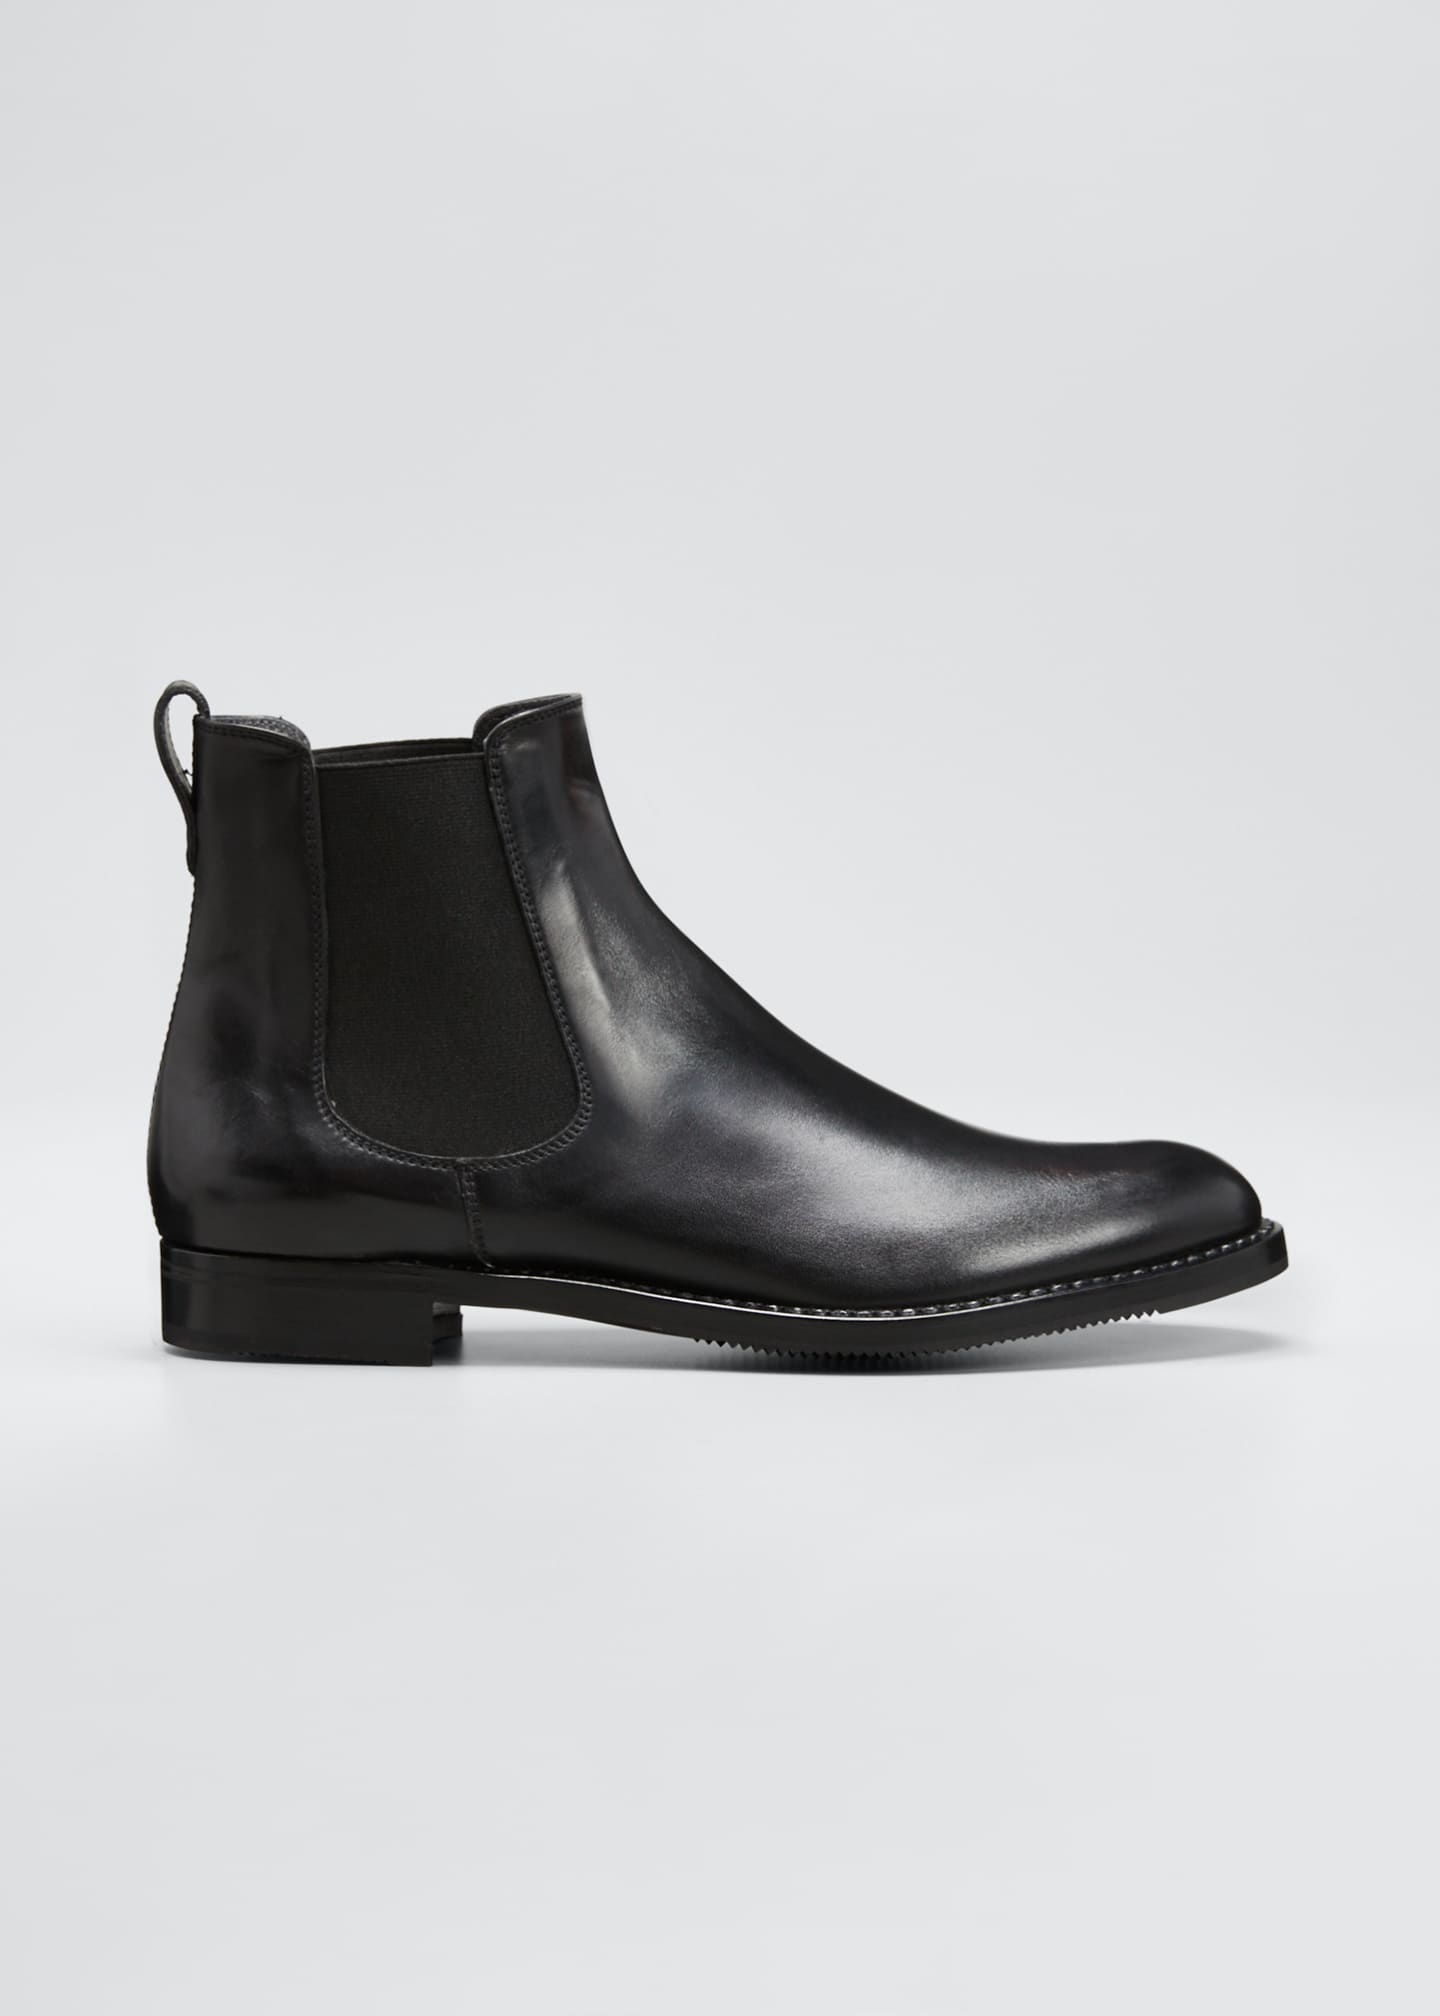 Gravati Tumbled Leather Chelsea Boots